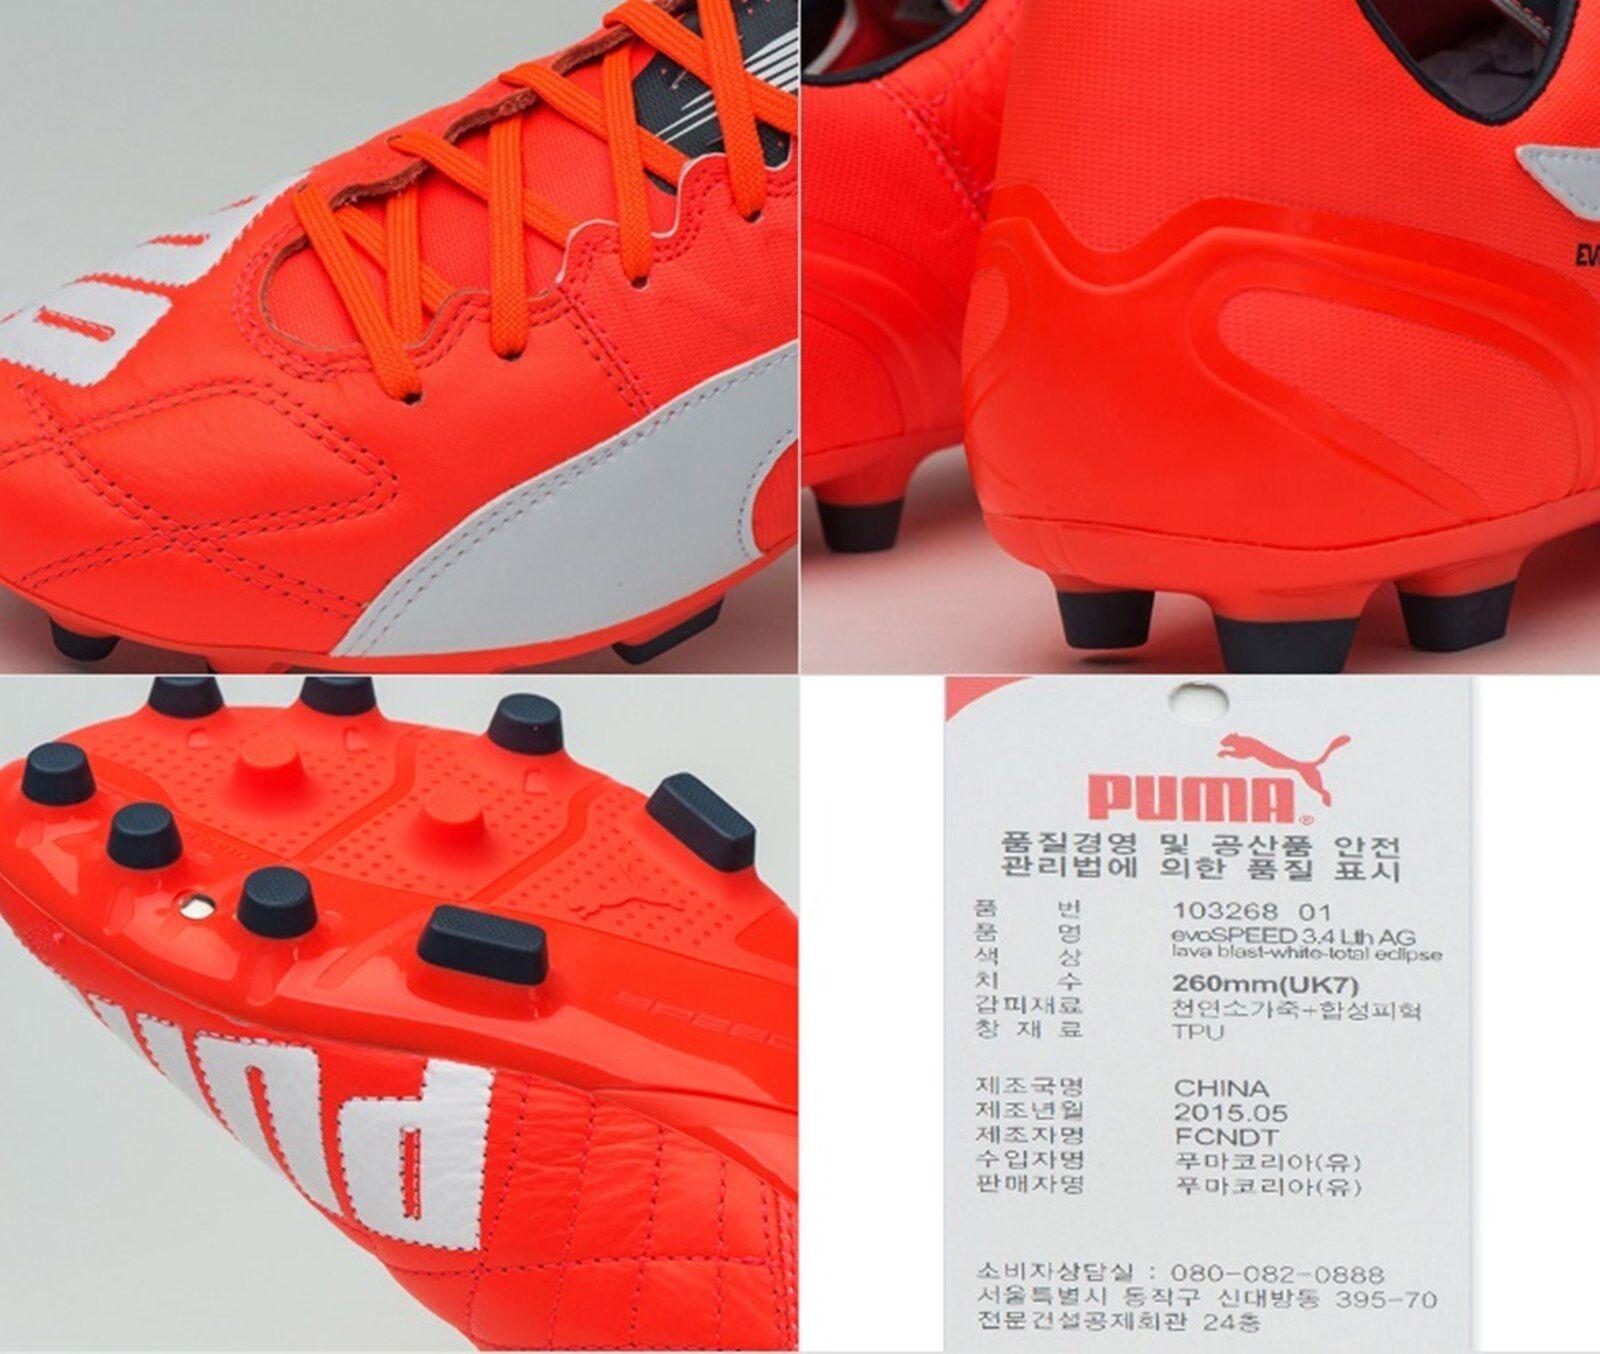 PUMA Men evo-SPEED evo-SPEED Men 3.4 AG Leder Cleats ROT Soccer Schuhes Stiefel Spike 103268-01 1ceed0